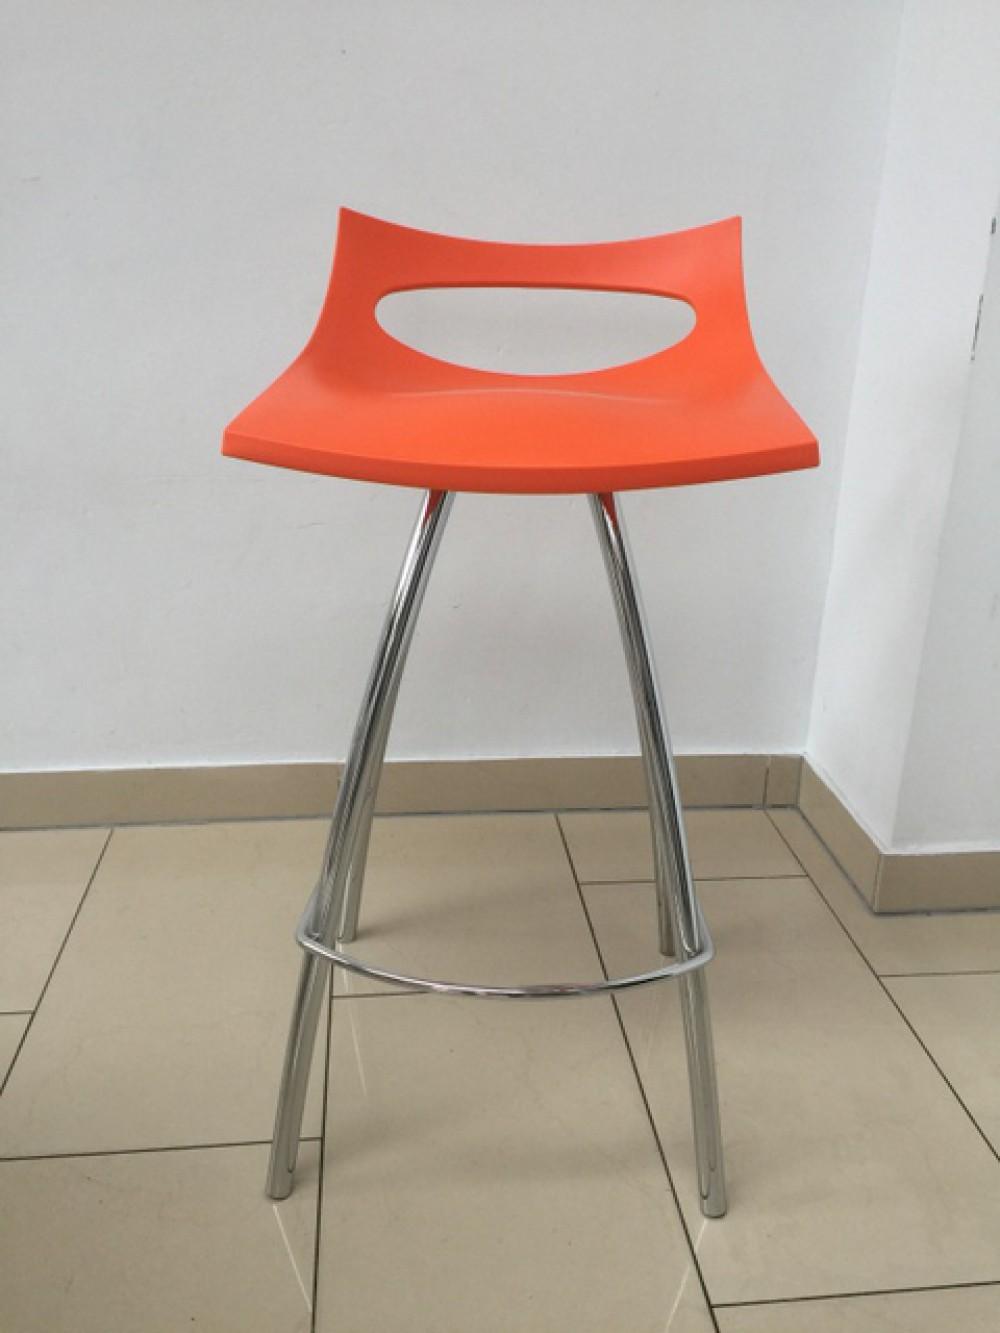 barhocker orange verchromtes gestell barstuhl orange sitzh he 65 cm. Black Bedroom Furniture Sets. Home Design Ideas